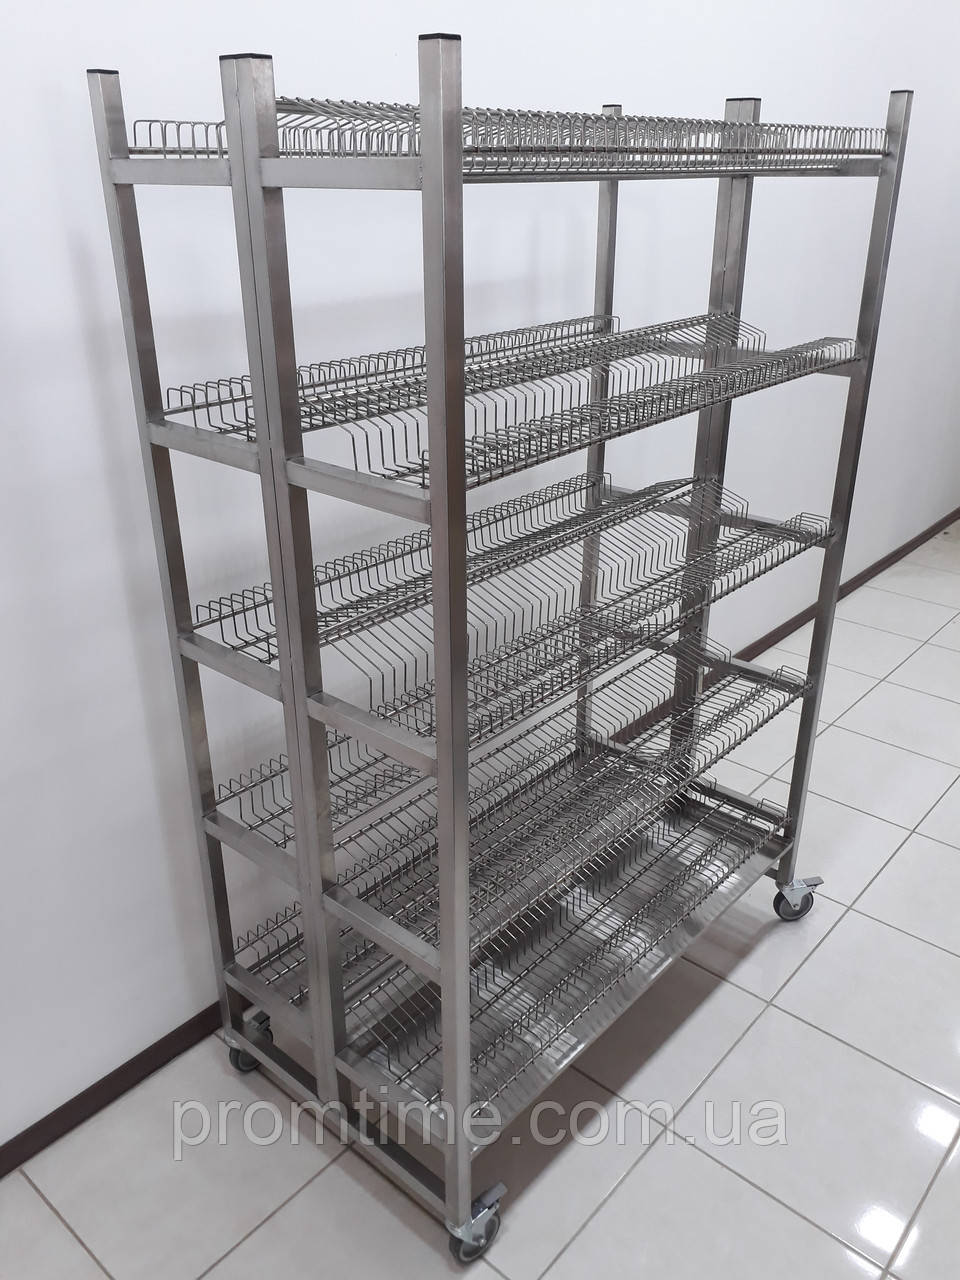 Стеллаж для сушки посуды 1200х640х1800 (сдвоеный)